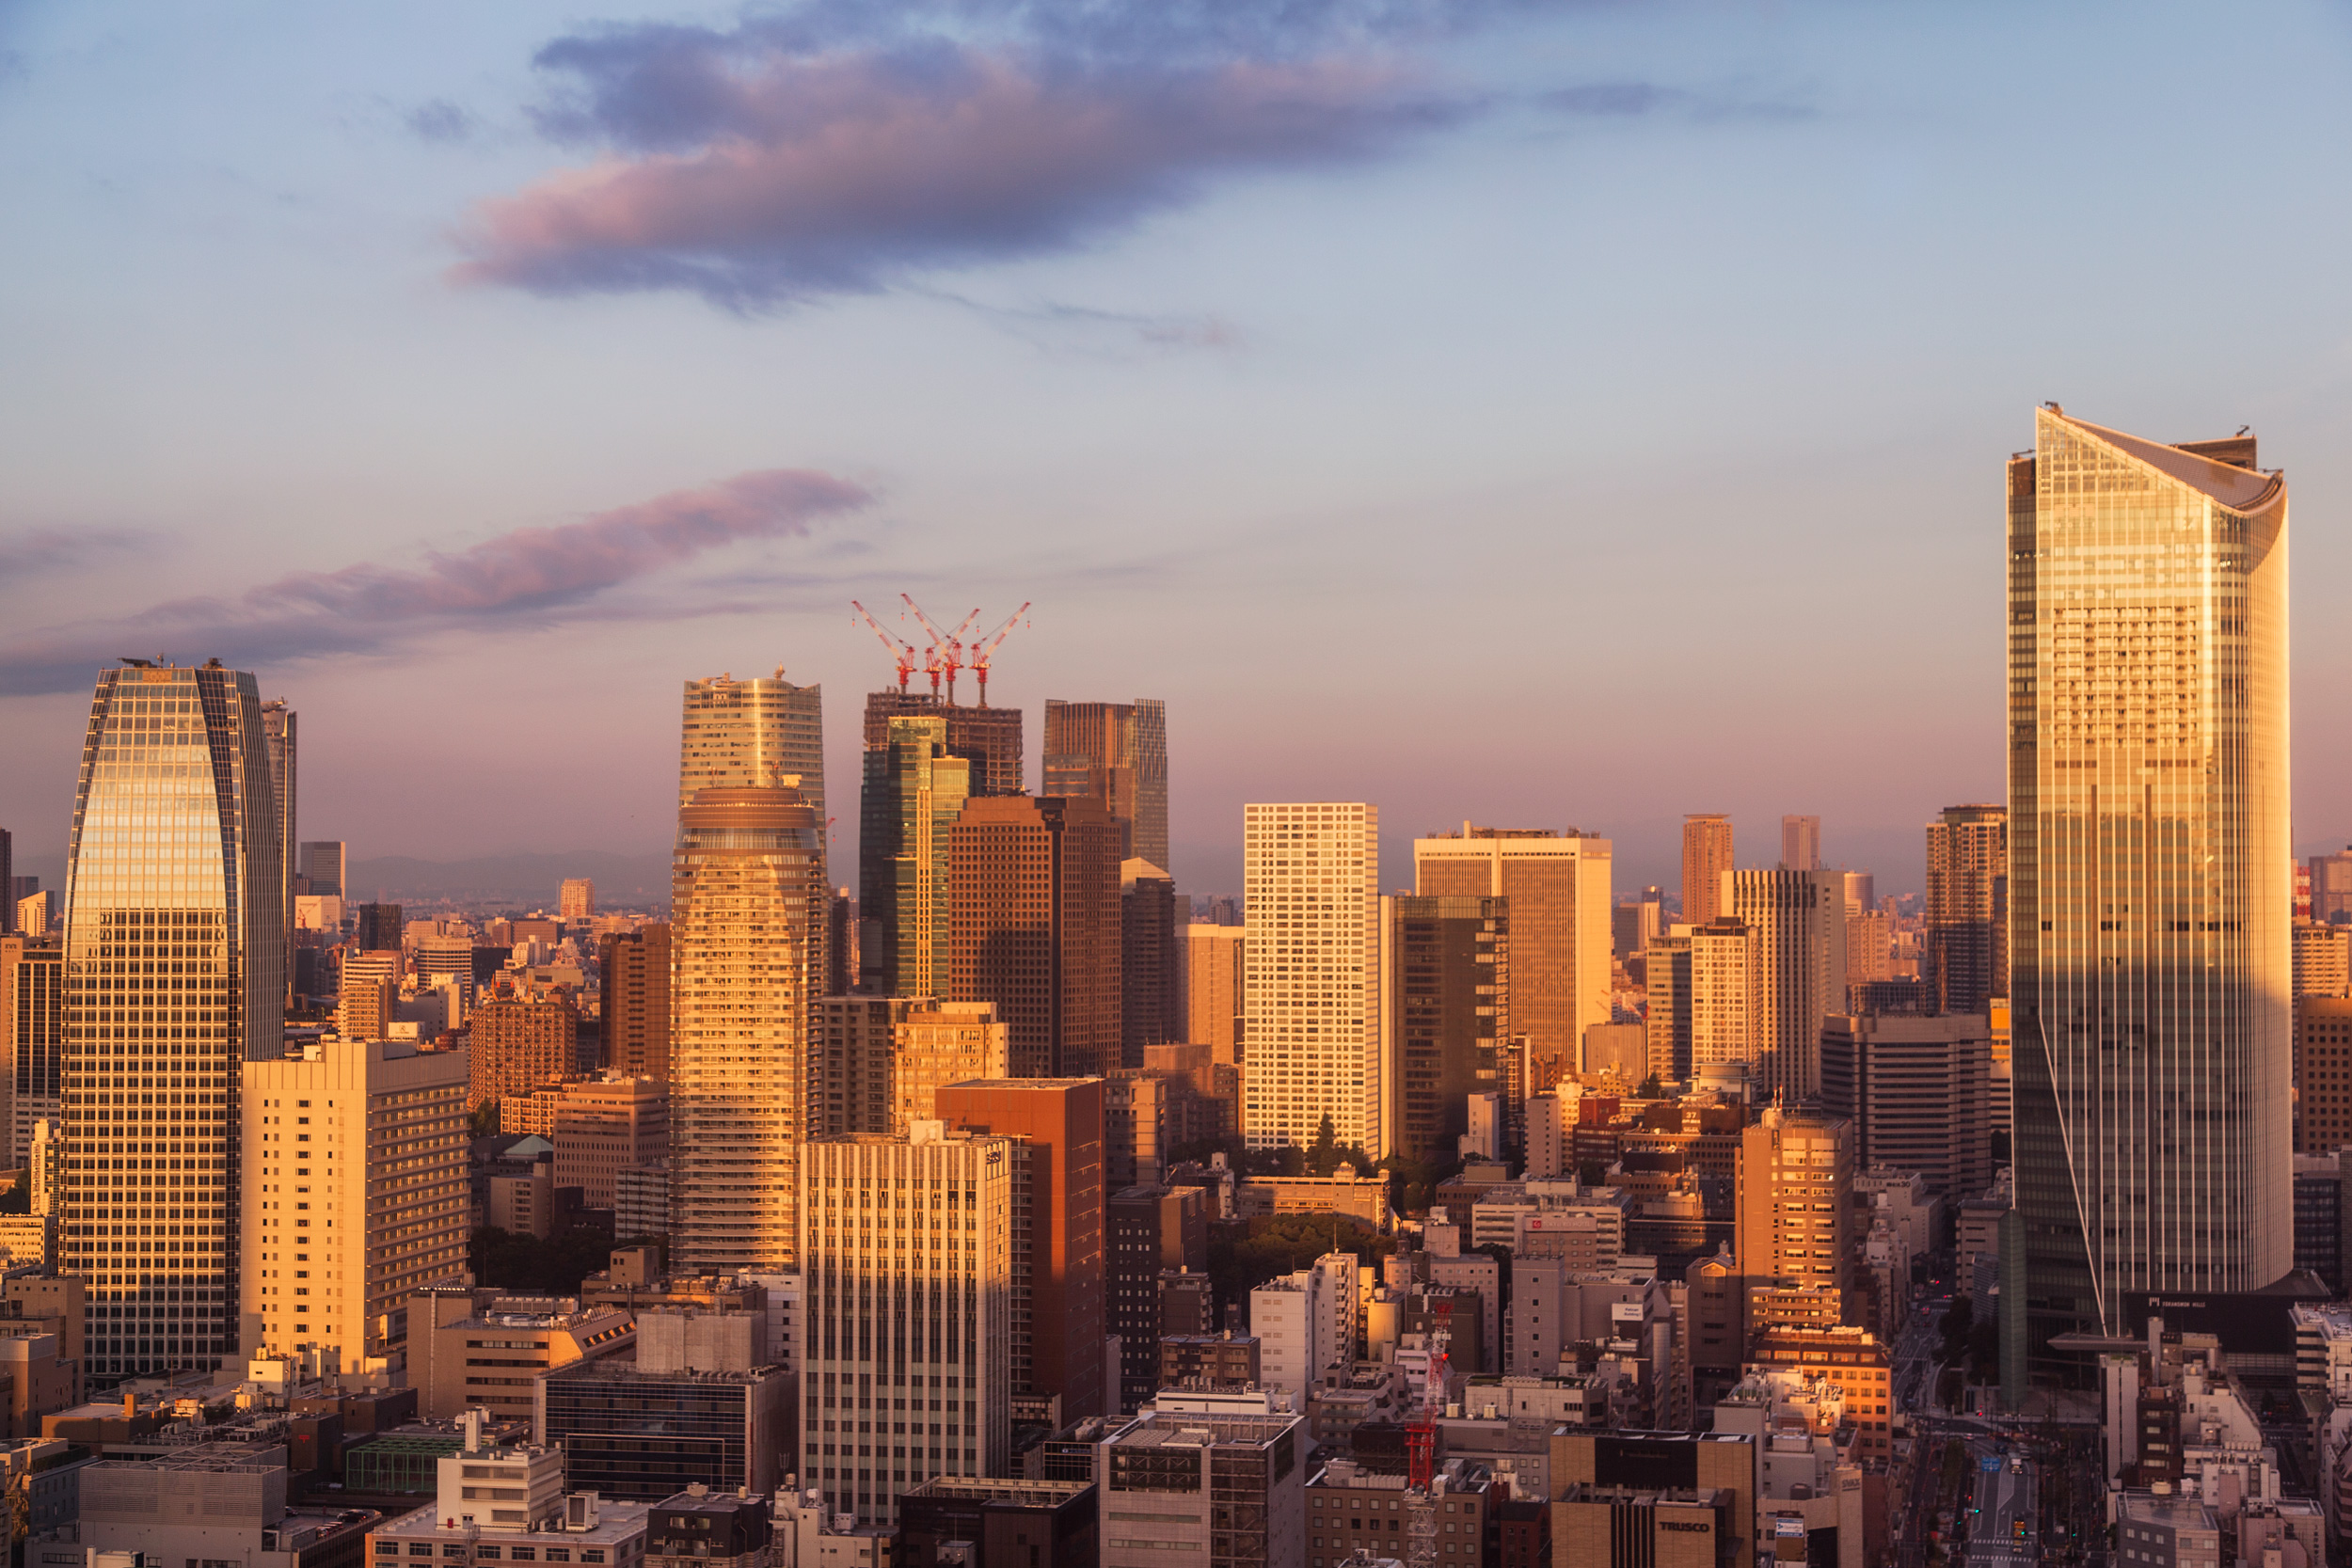 Sunrise over Tokyo